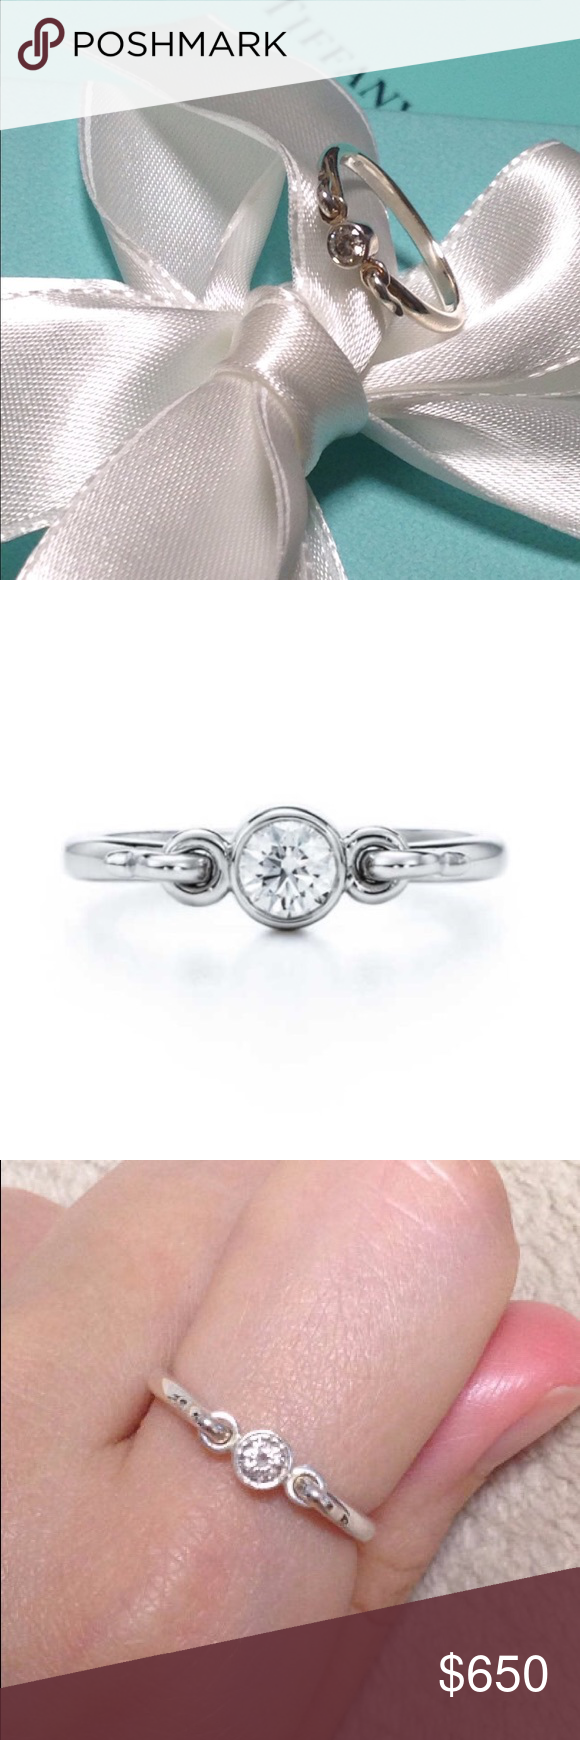 649be4bae Tiffany and Co Elsa Peretti Swan Diamond ring Tiffany and Co Elsa Peretti diamond  ring in